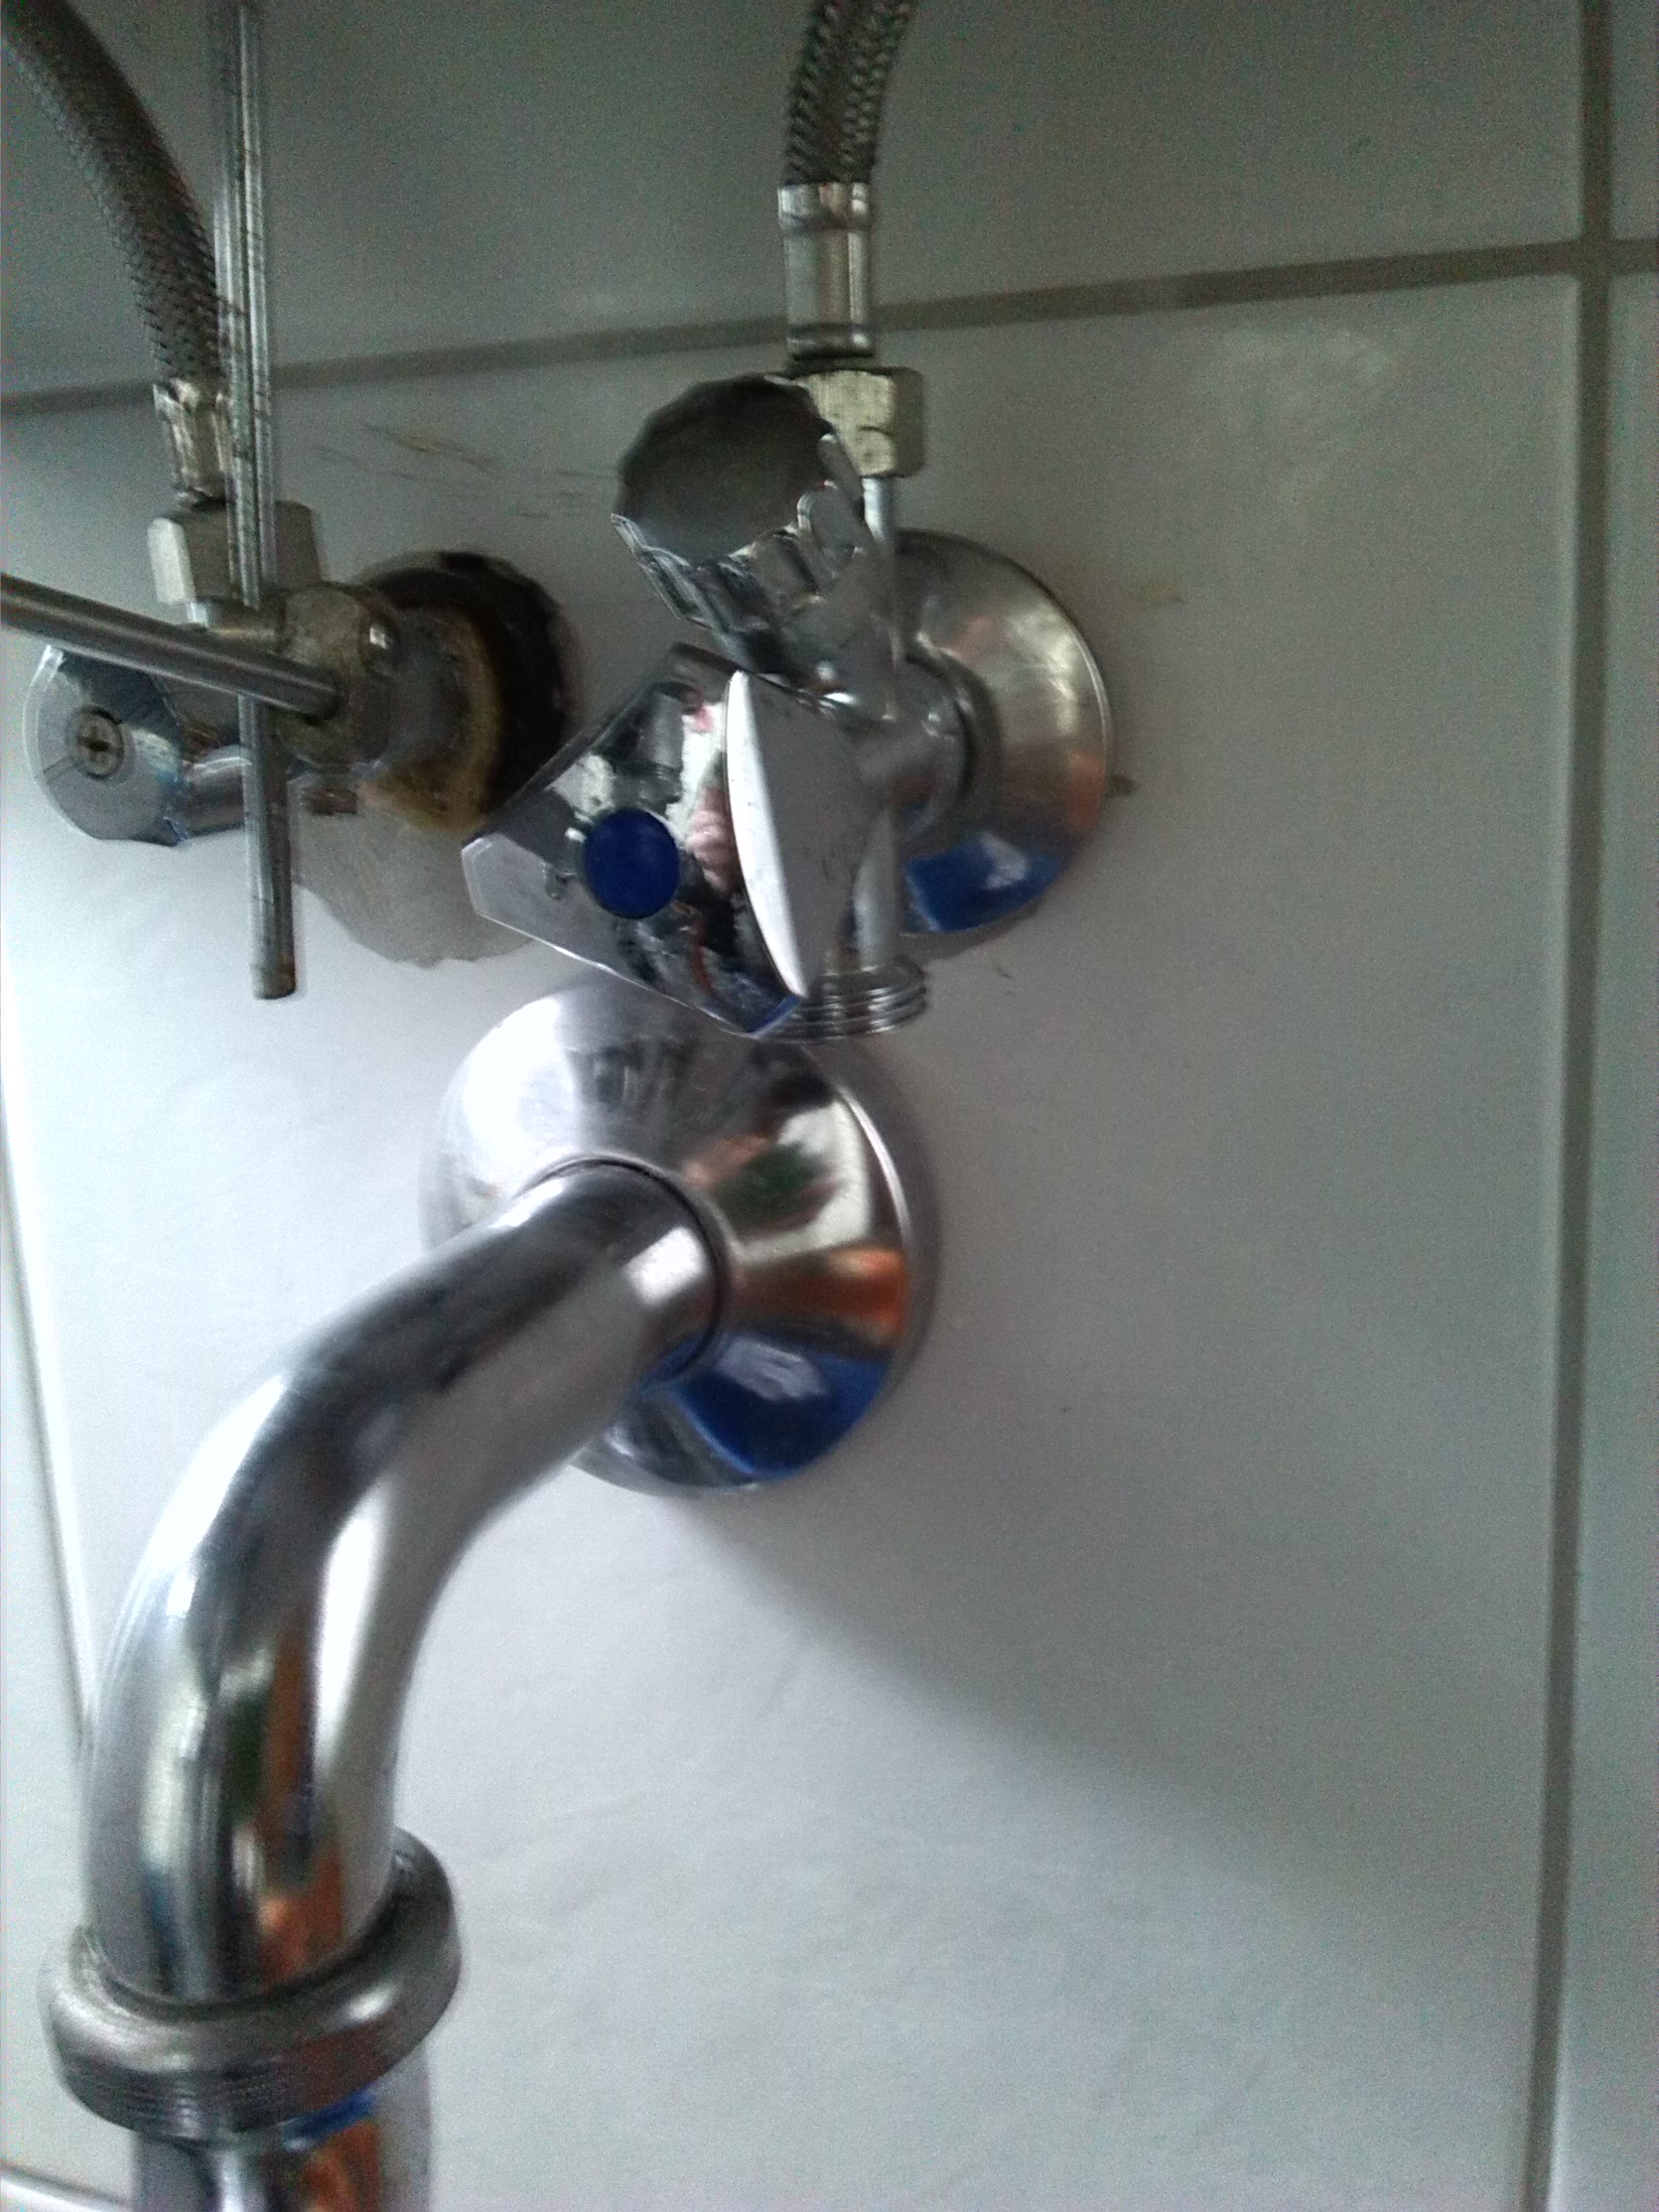 waschmaschine an waschbecken anschliesen alles ber wohndesign und m belideen. Black Bedroom Furniture Sets. Home Design Ideas